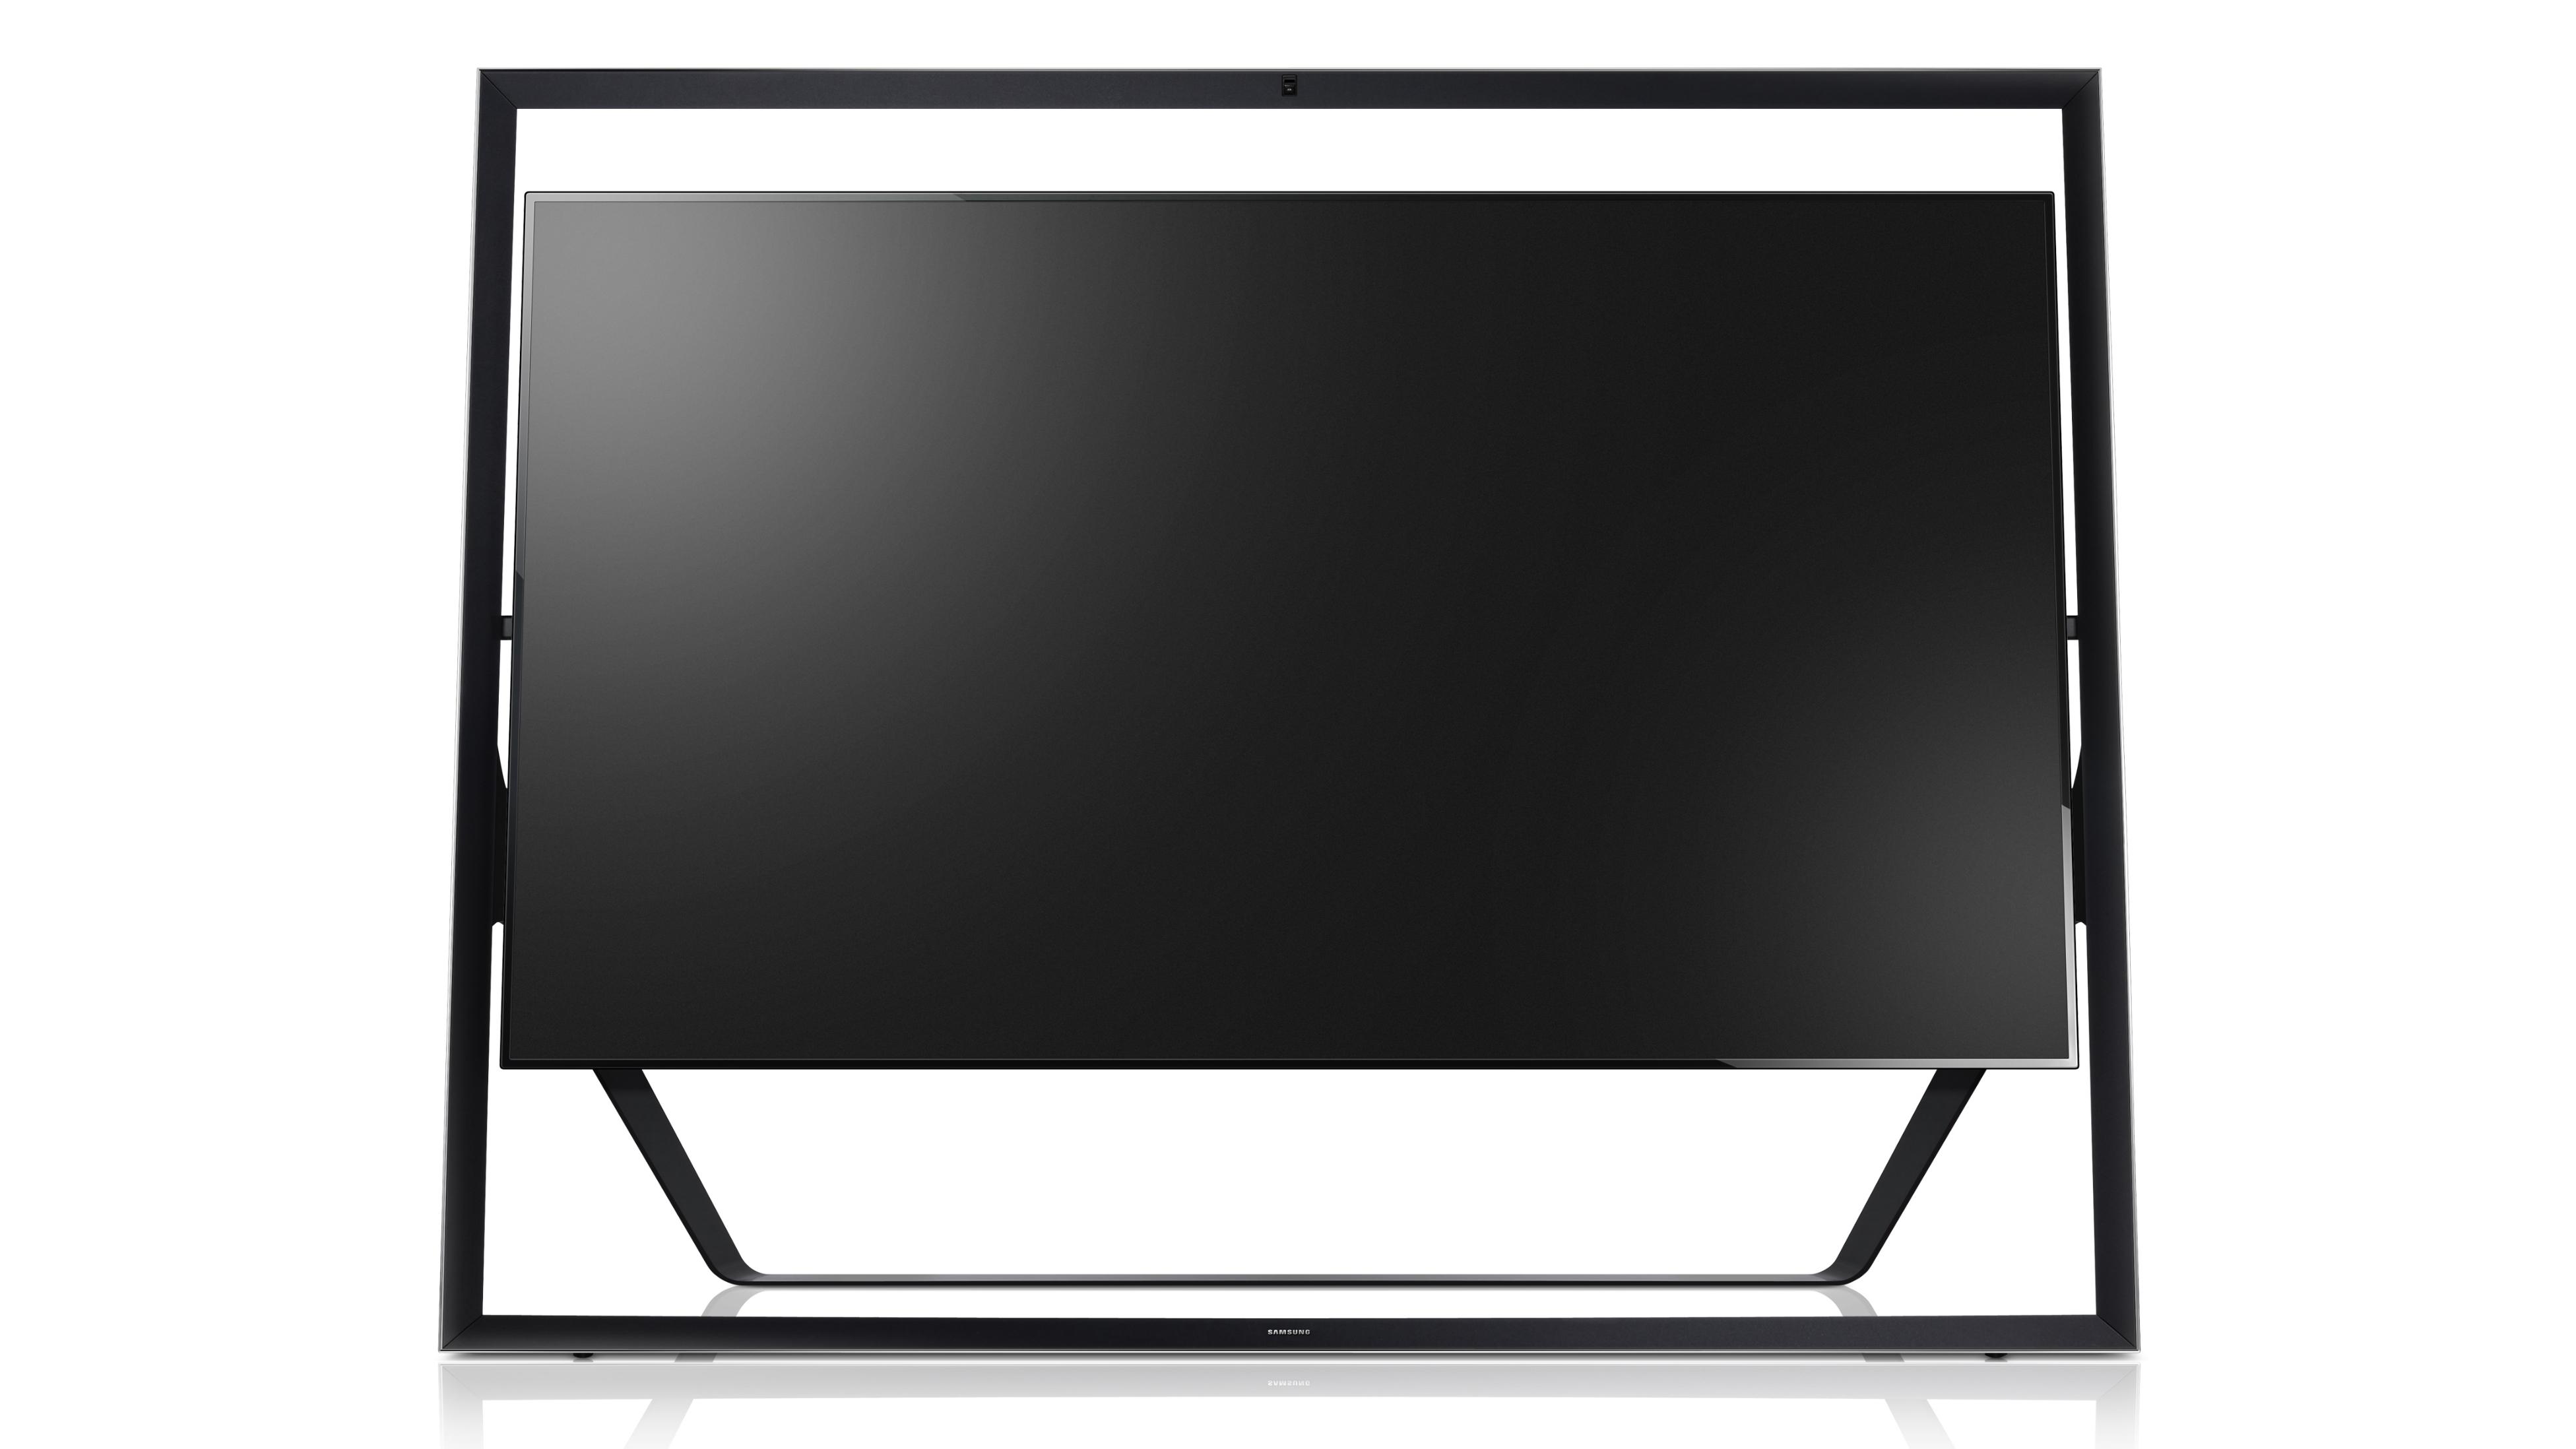 Samsung 85-inch TV